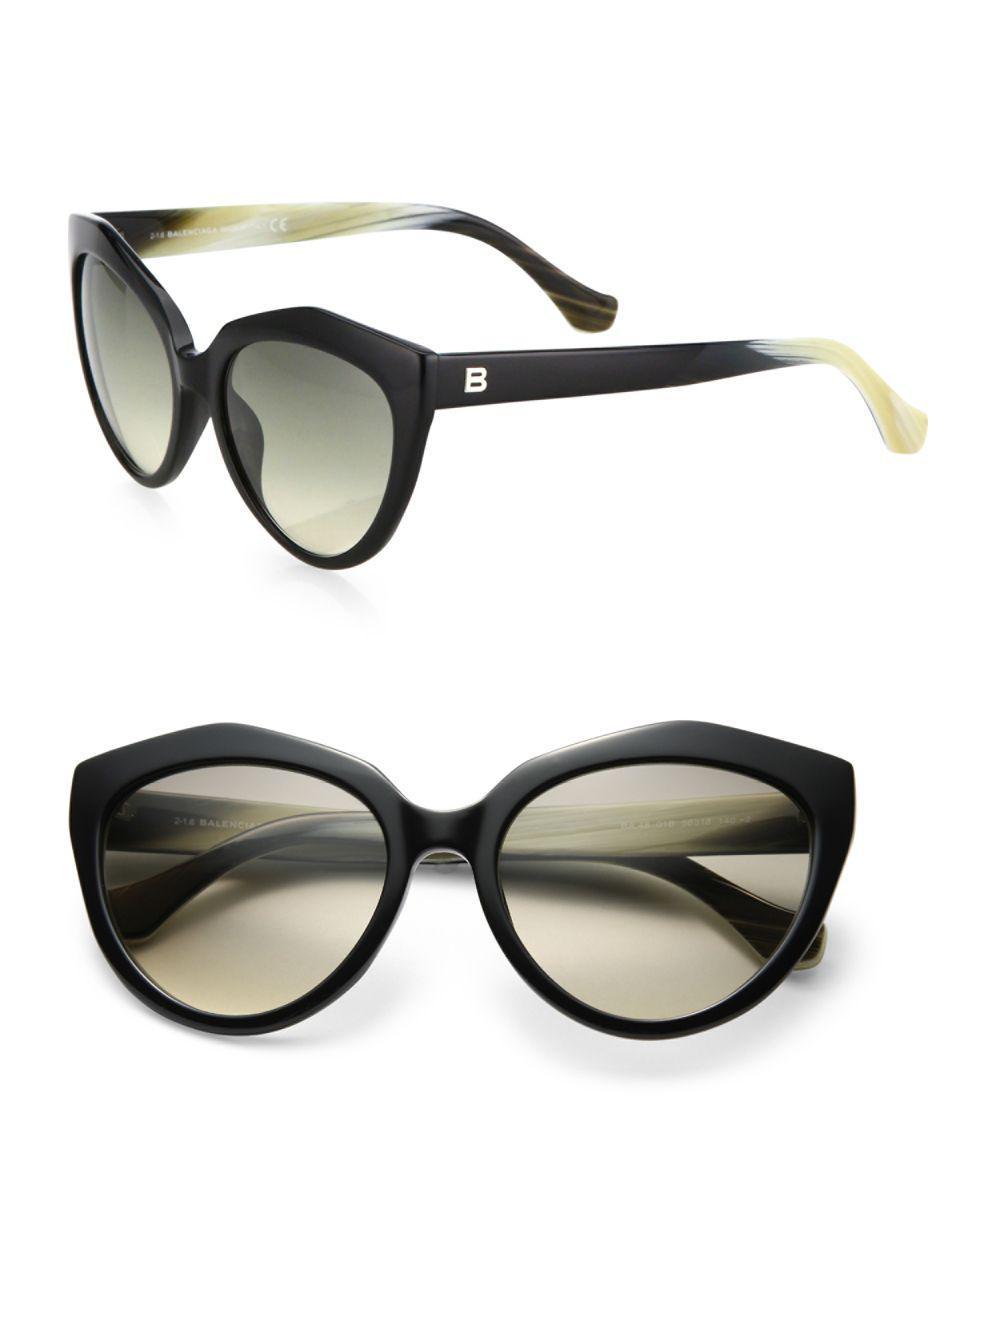 2d0ce00b89b Lyst - Balenciaga 56mm Acetate Cat s-eye Sunglasses in Black for Men